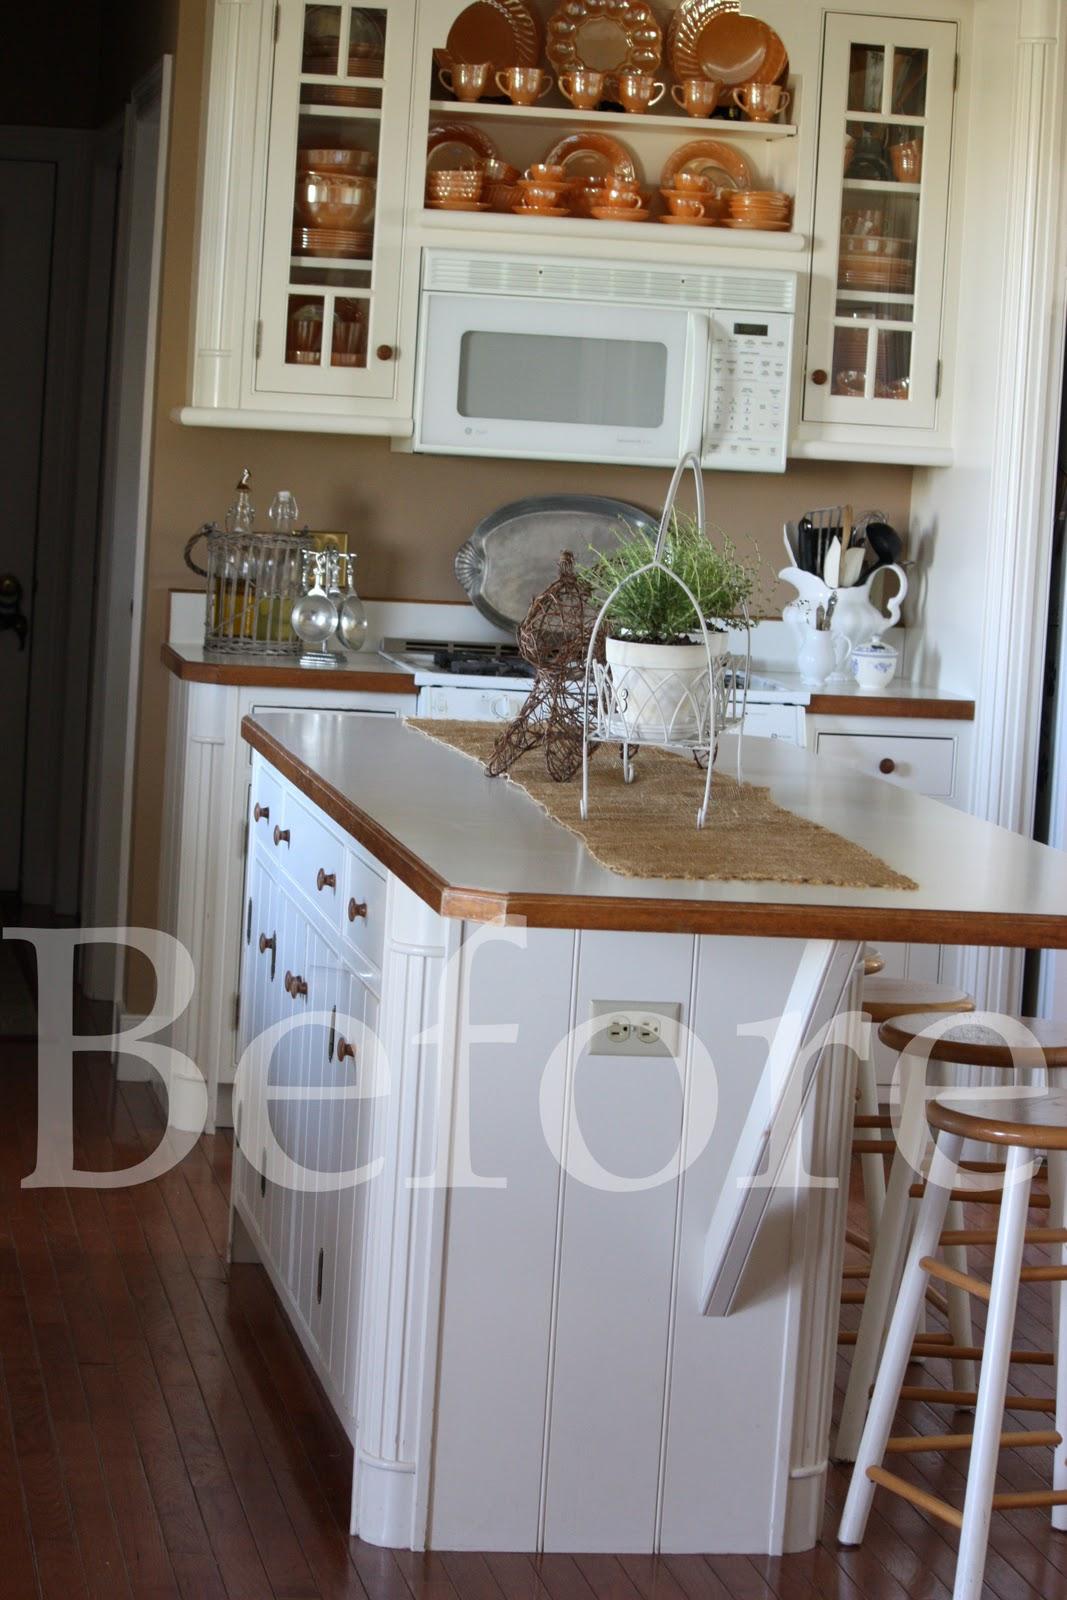 Stonegable S Farmhouse Kitchen Reveal Stonegable